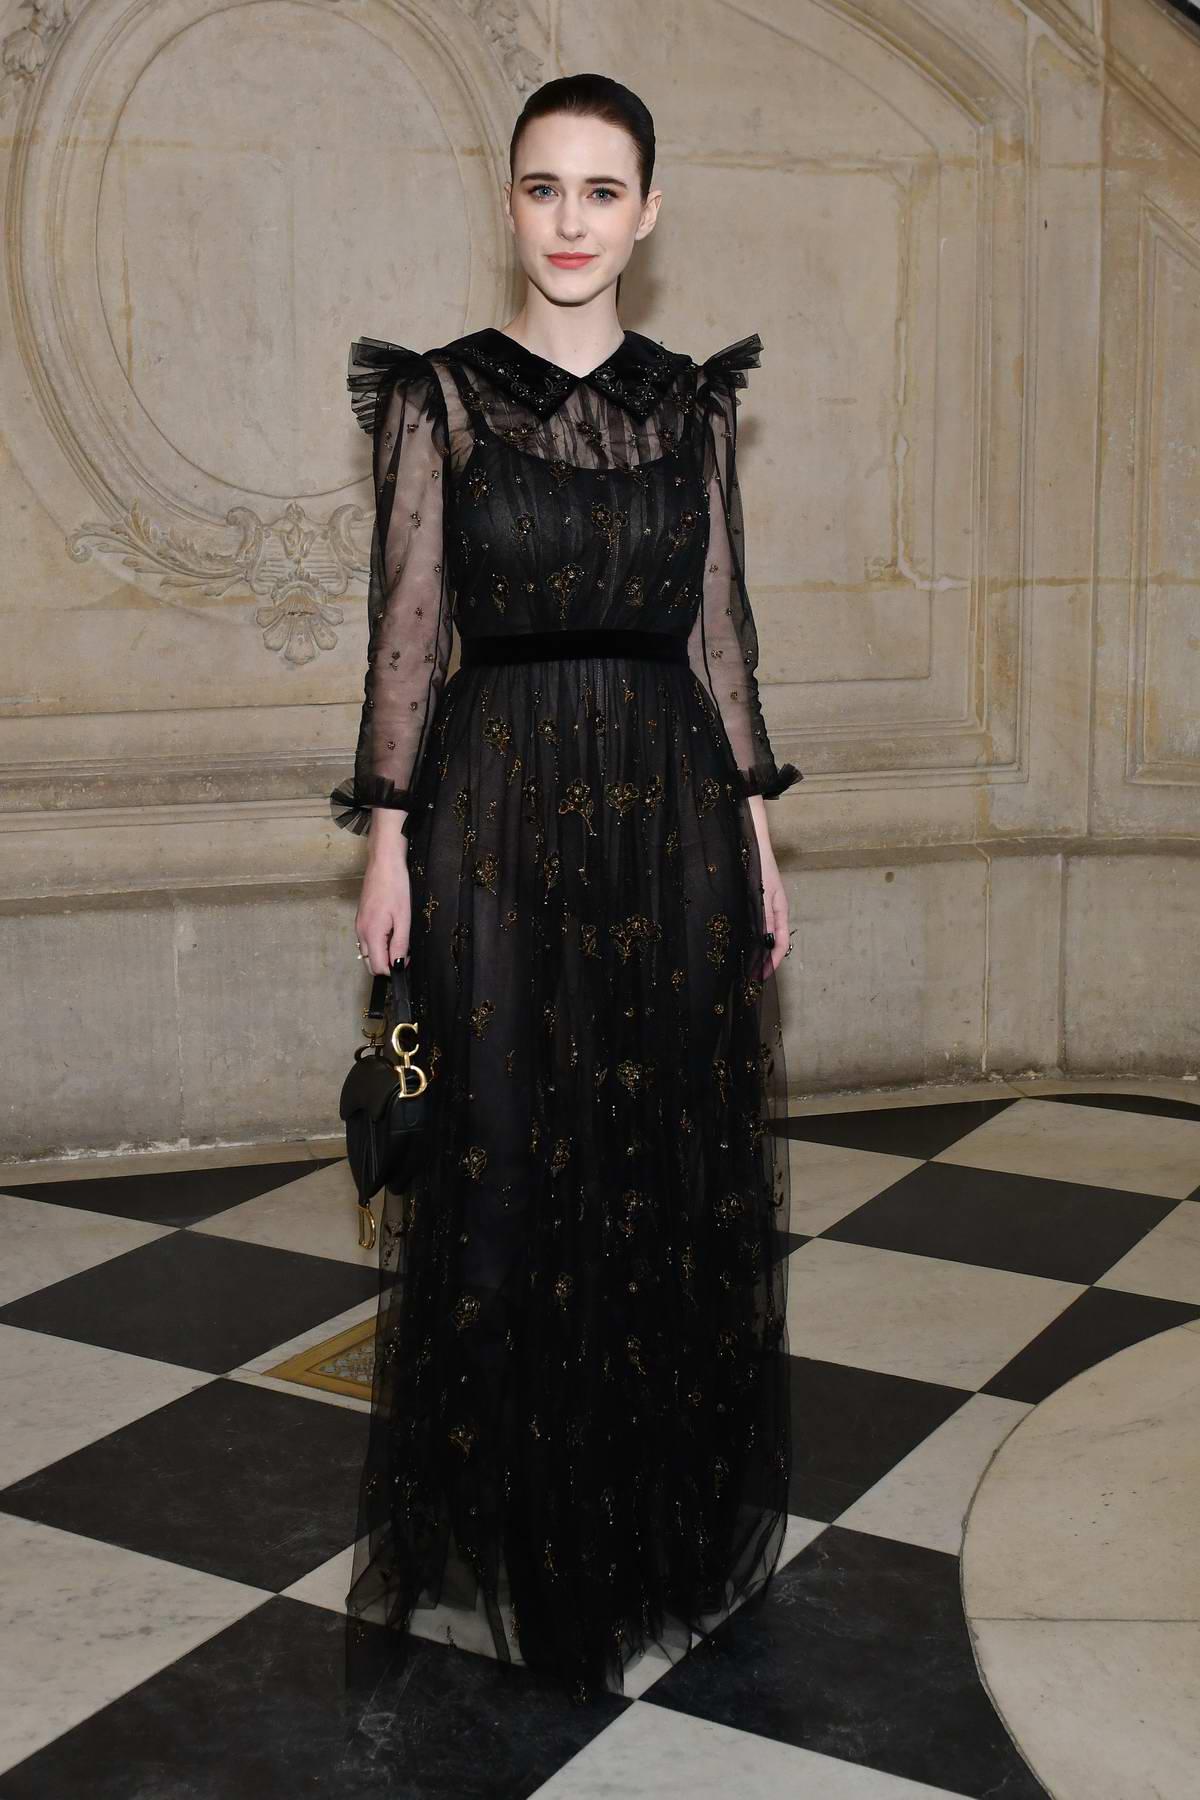 Rachel Brosnahan attends Christian Dior Haute Couture Spring/Summer 2019 Show during Paris Fashion Week in Paris, France